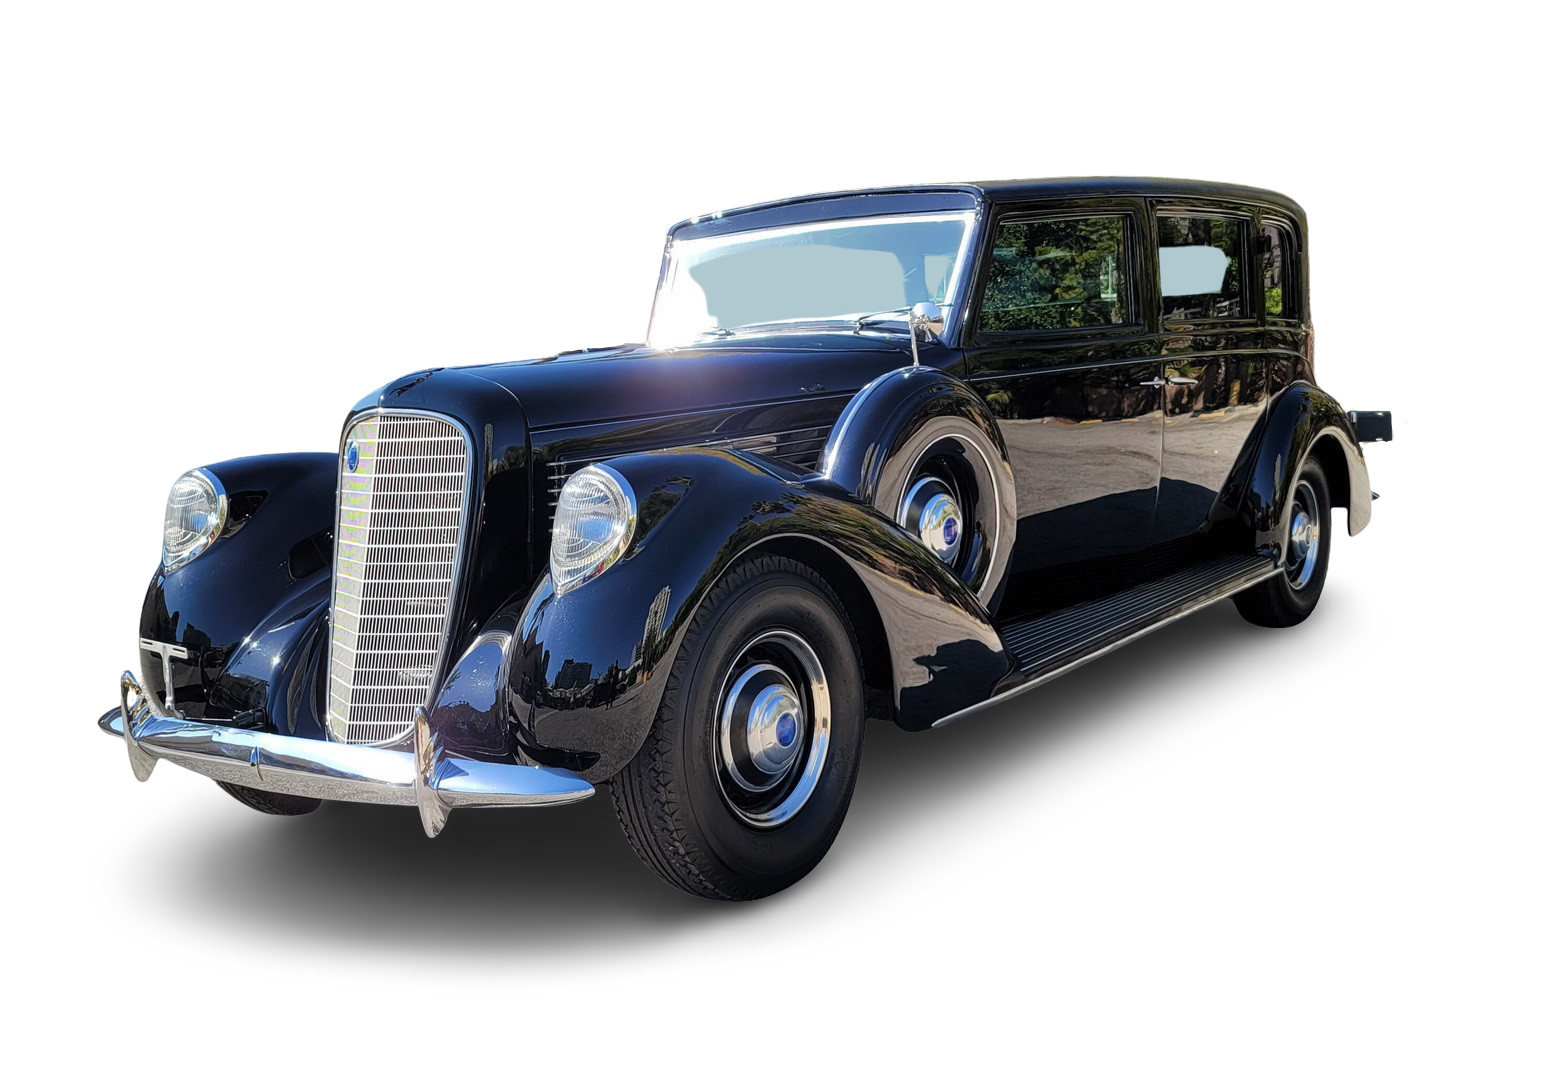 1939 Lincoln Model K limousine